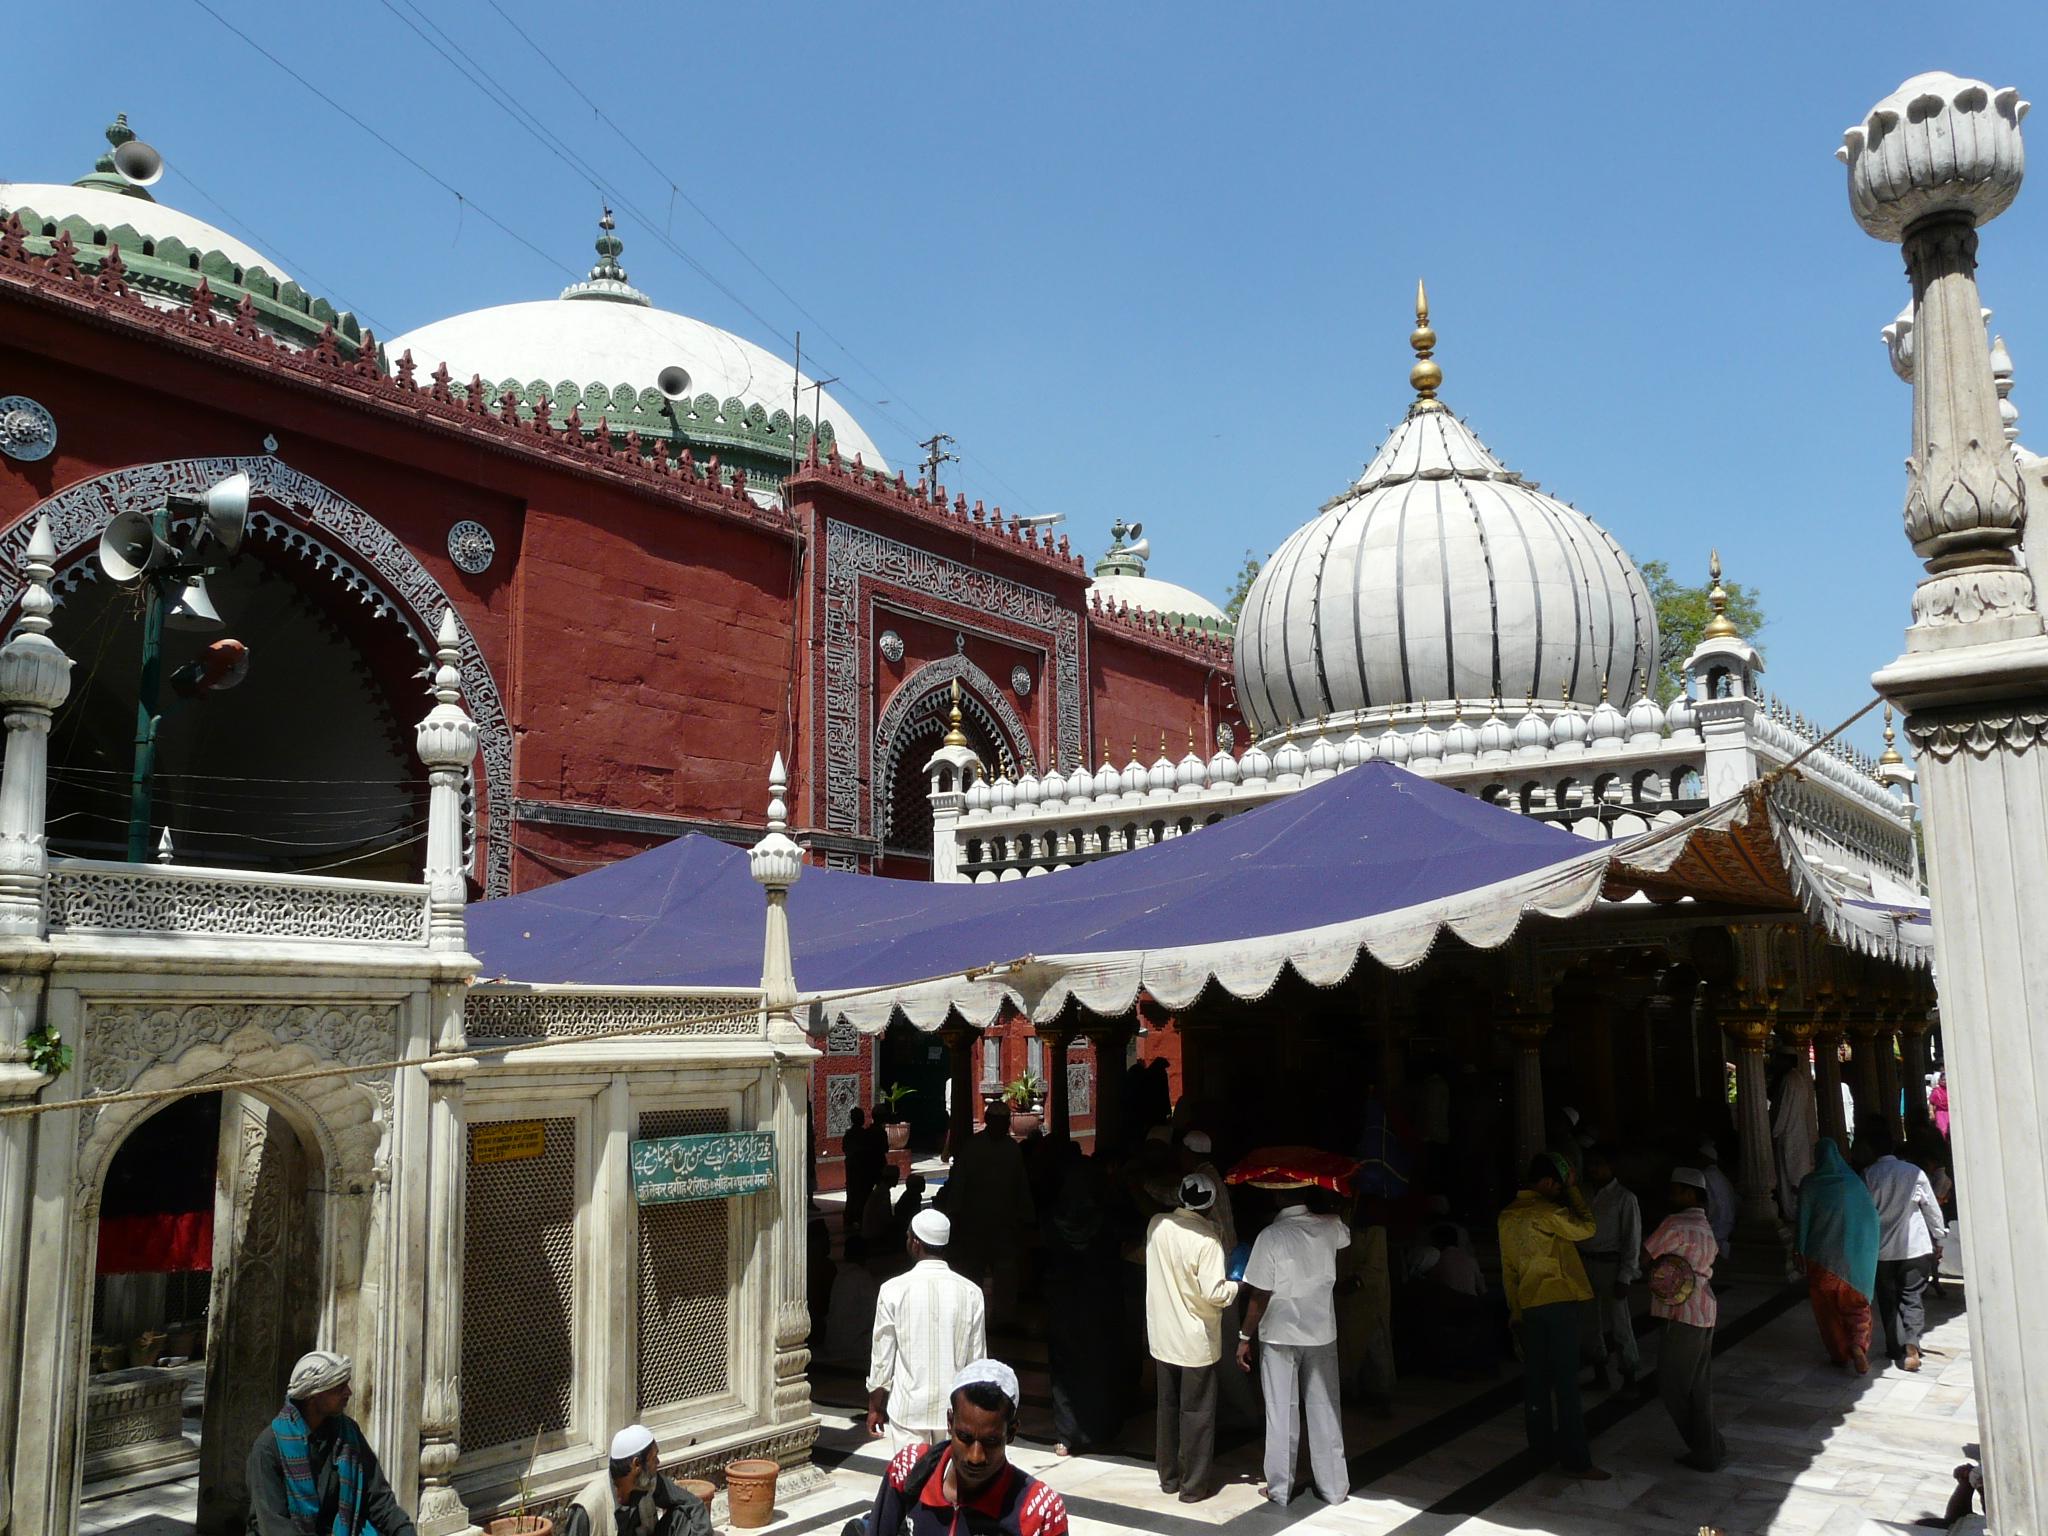 Hazrat Nizamuddin (Nizamuddin's Shrine)